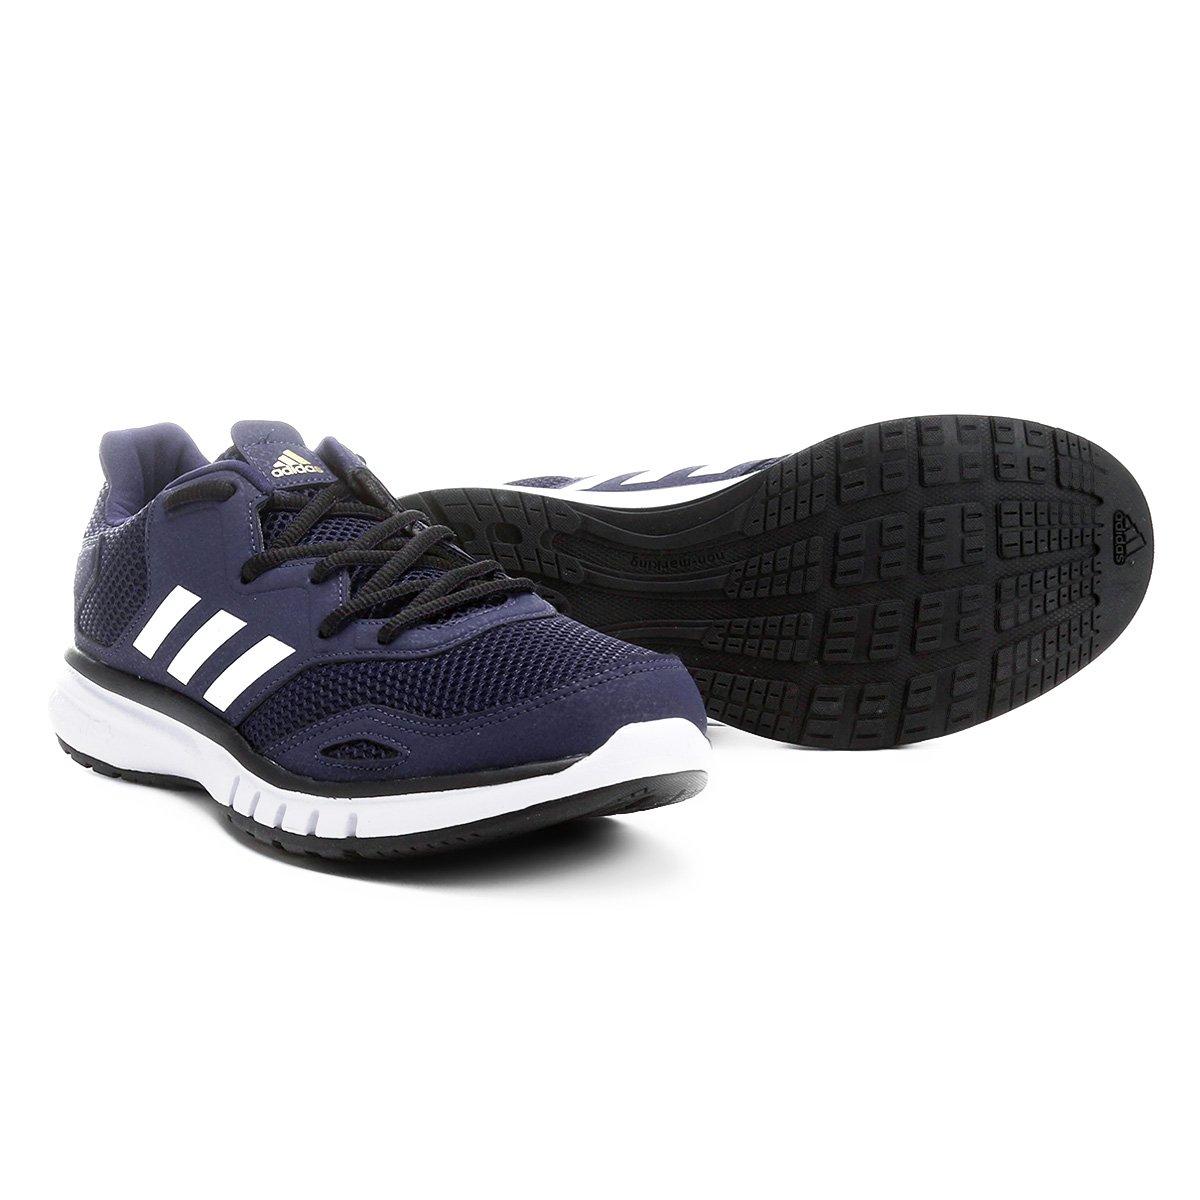 Tênis Adidas Prostar Masculino